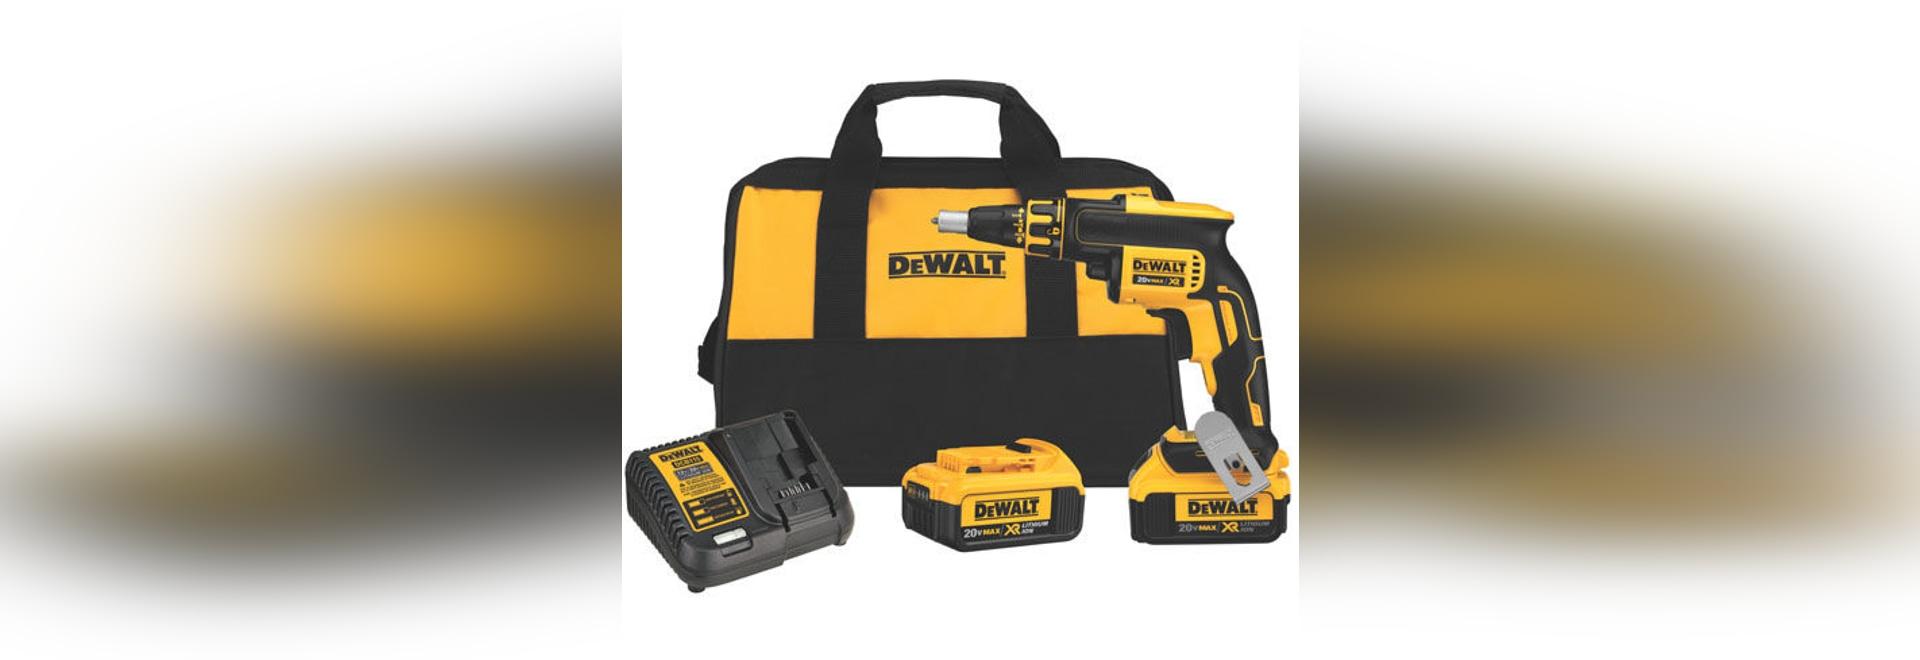 NEW: corded electric screwdriver by DEWALT Industrial Tool